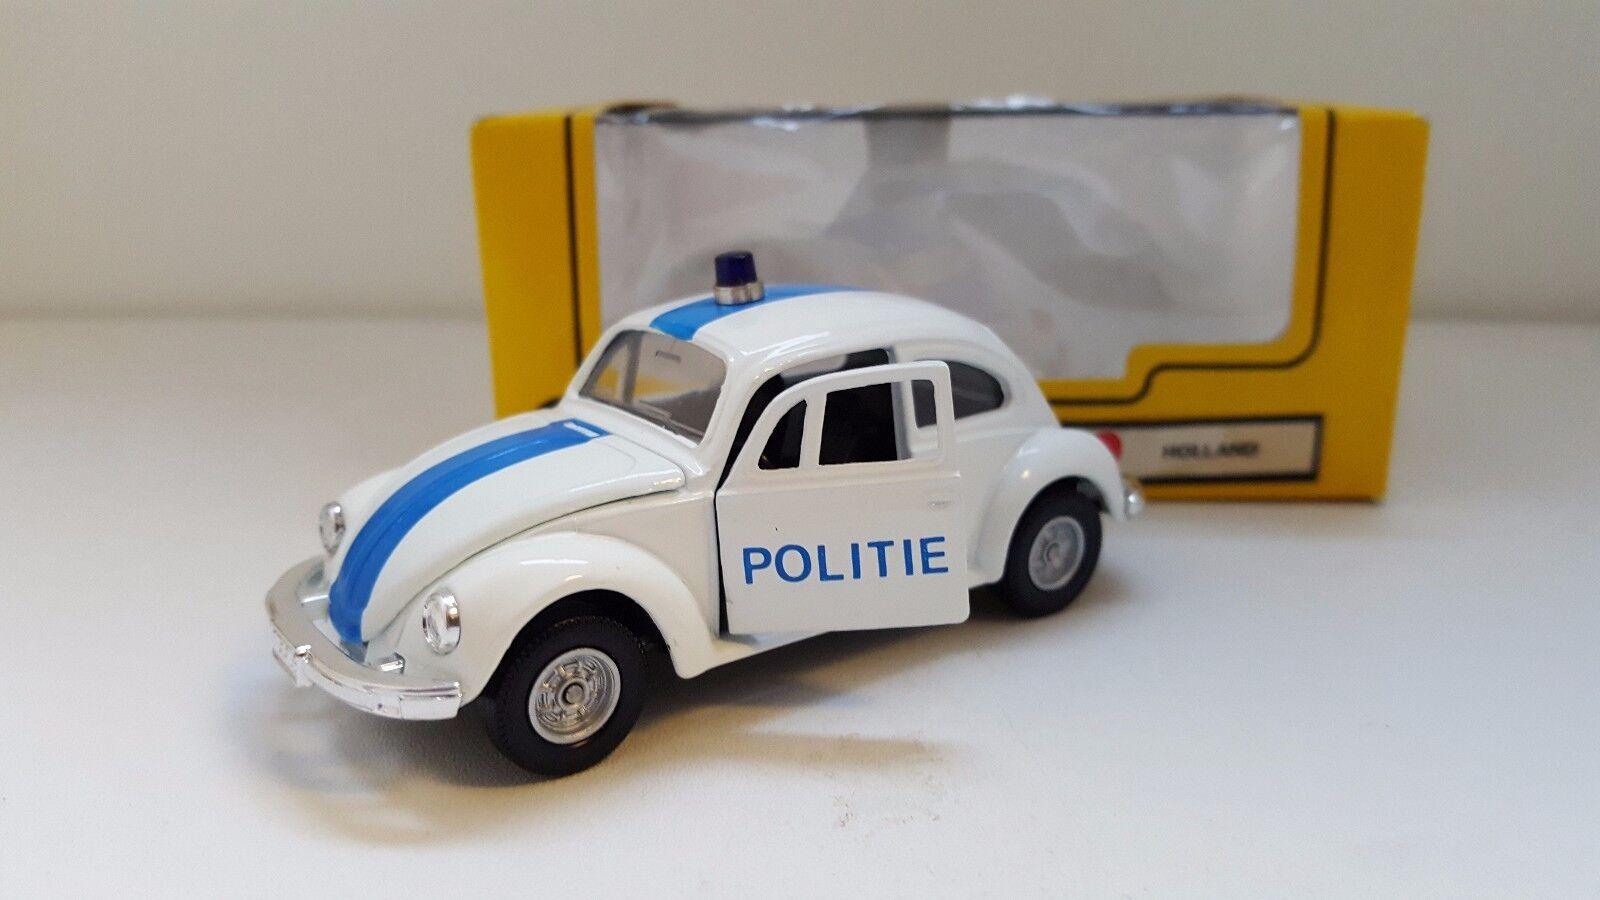 Tomica Dandy / Kado - KT 18 - Volkswagen Beetle 1200 LE Politie Holland  1/43